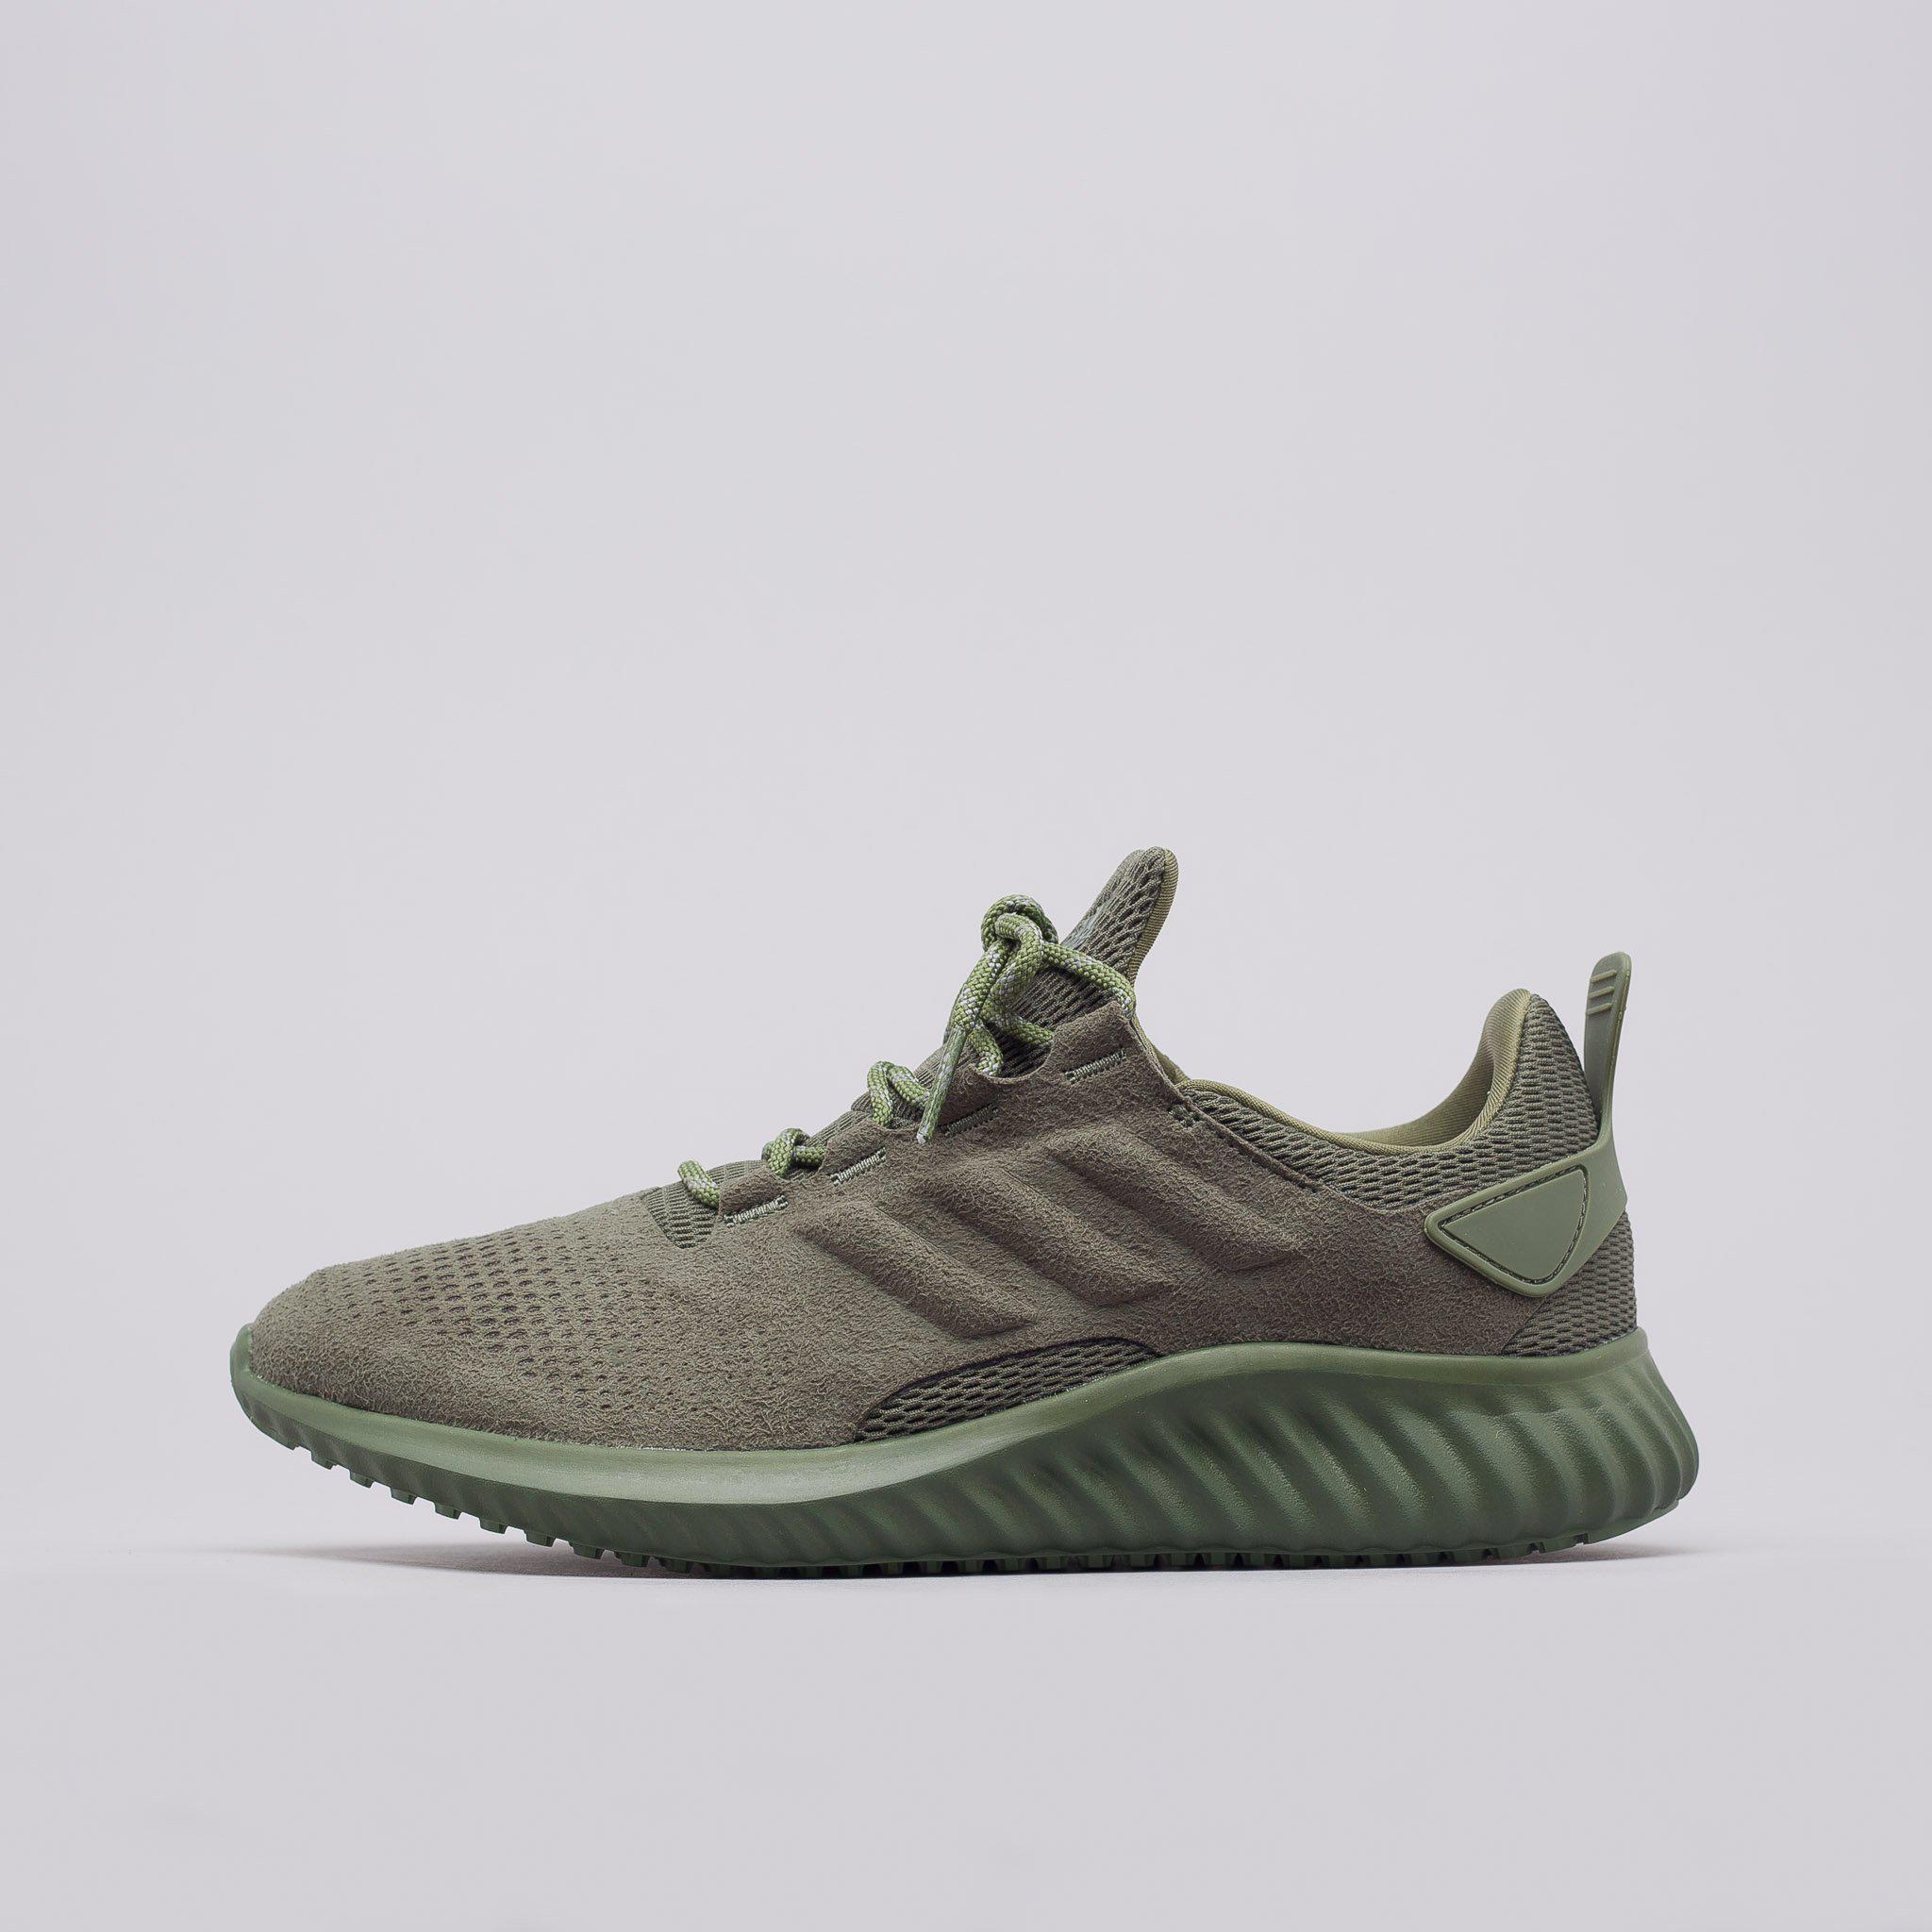 2bca998736320 Lyst - adidas Alphabounce City Run In Green in Green for Men